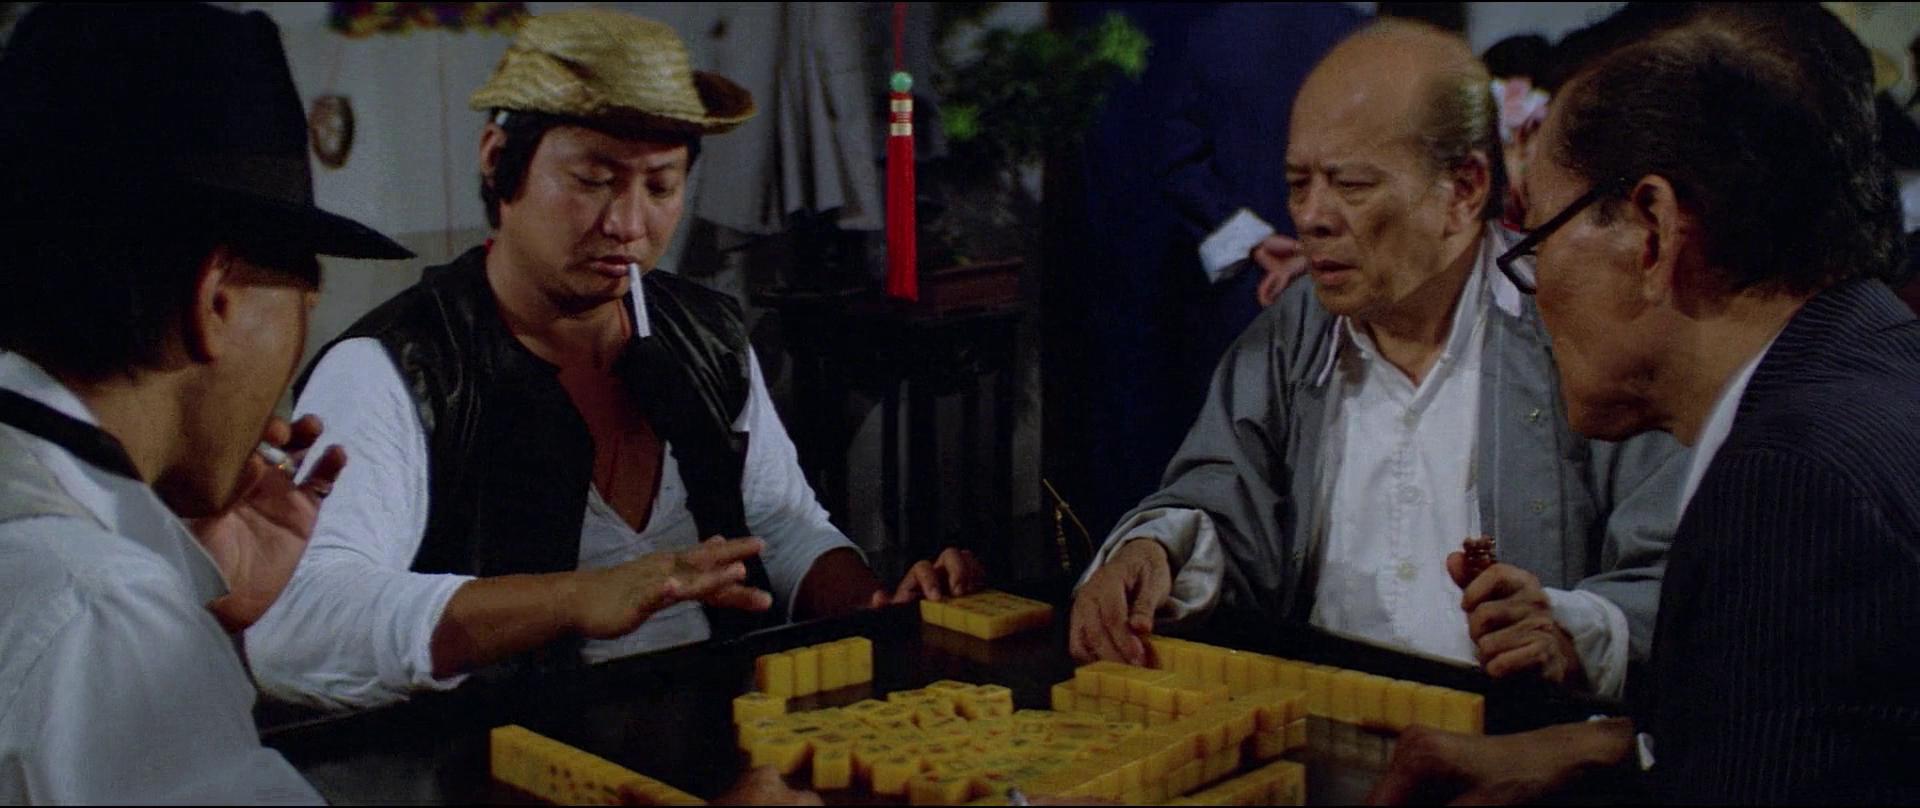 Sammo Kam-Bo Hung in A gai waak (1983)